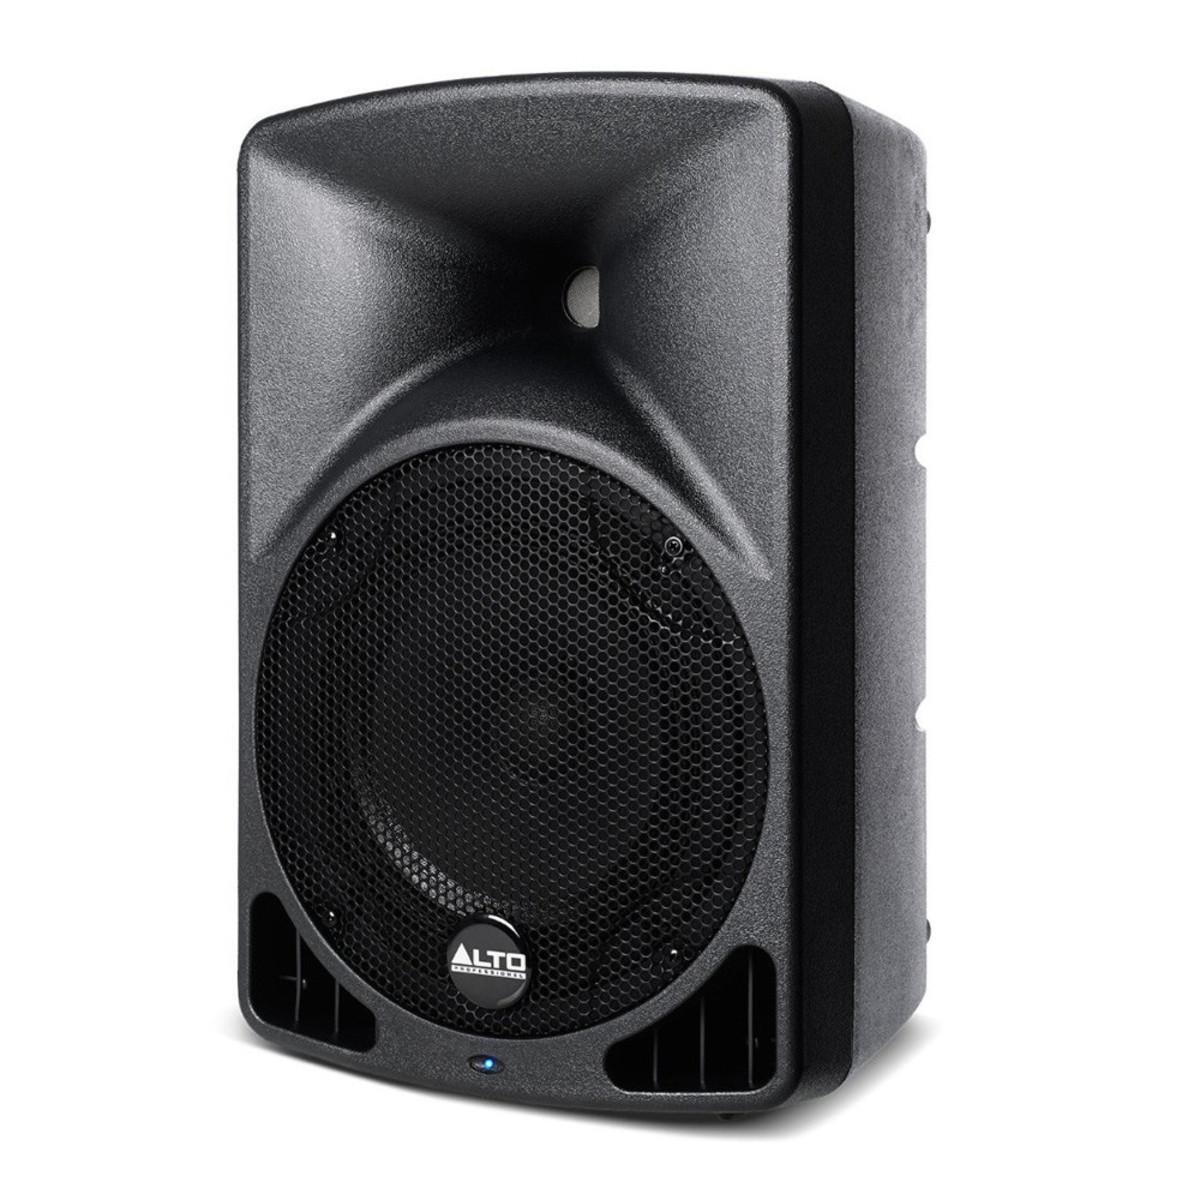 Image of Alto TX10 Active PA Loudspeaker